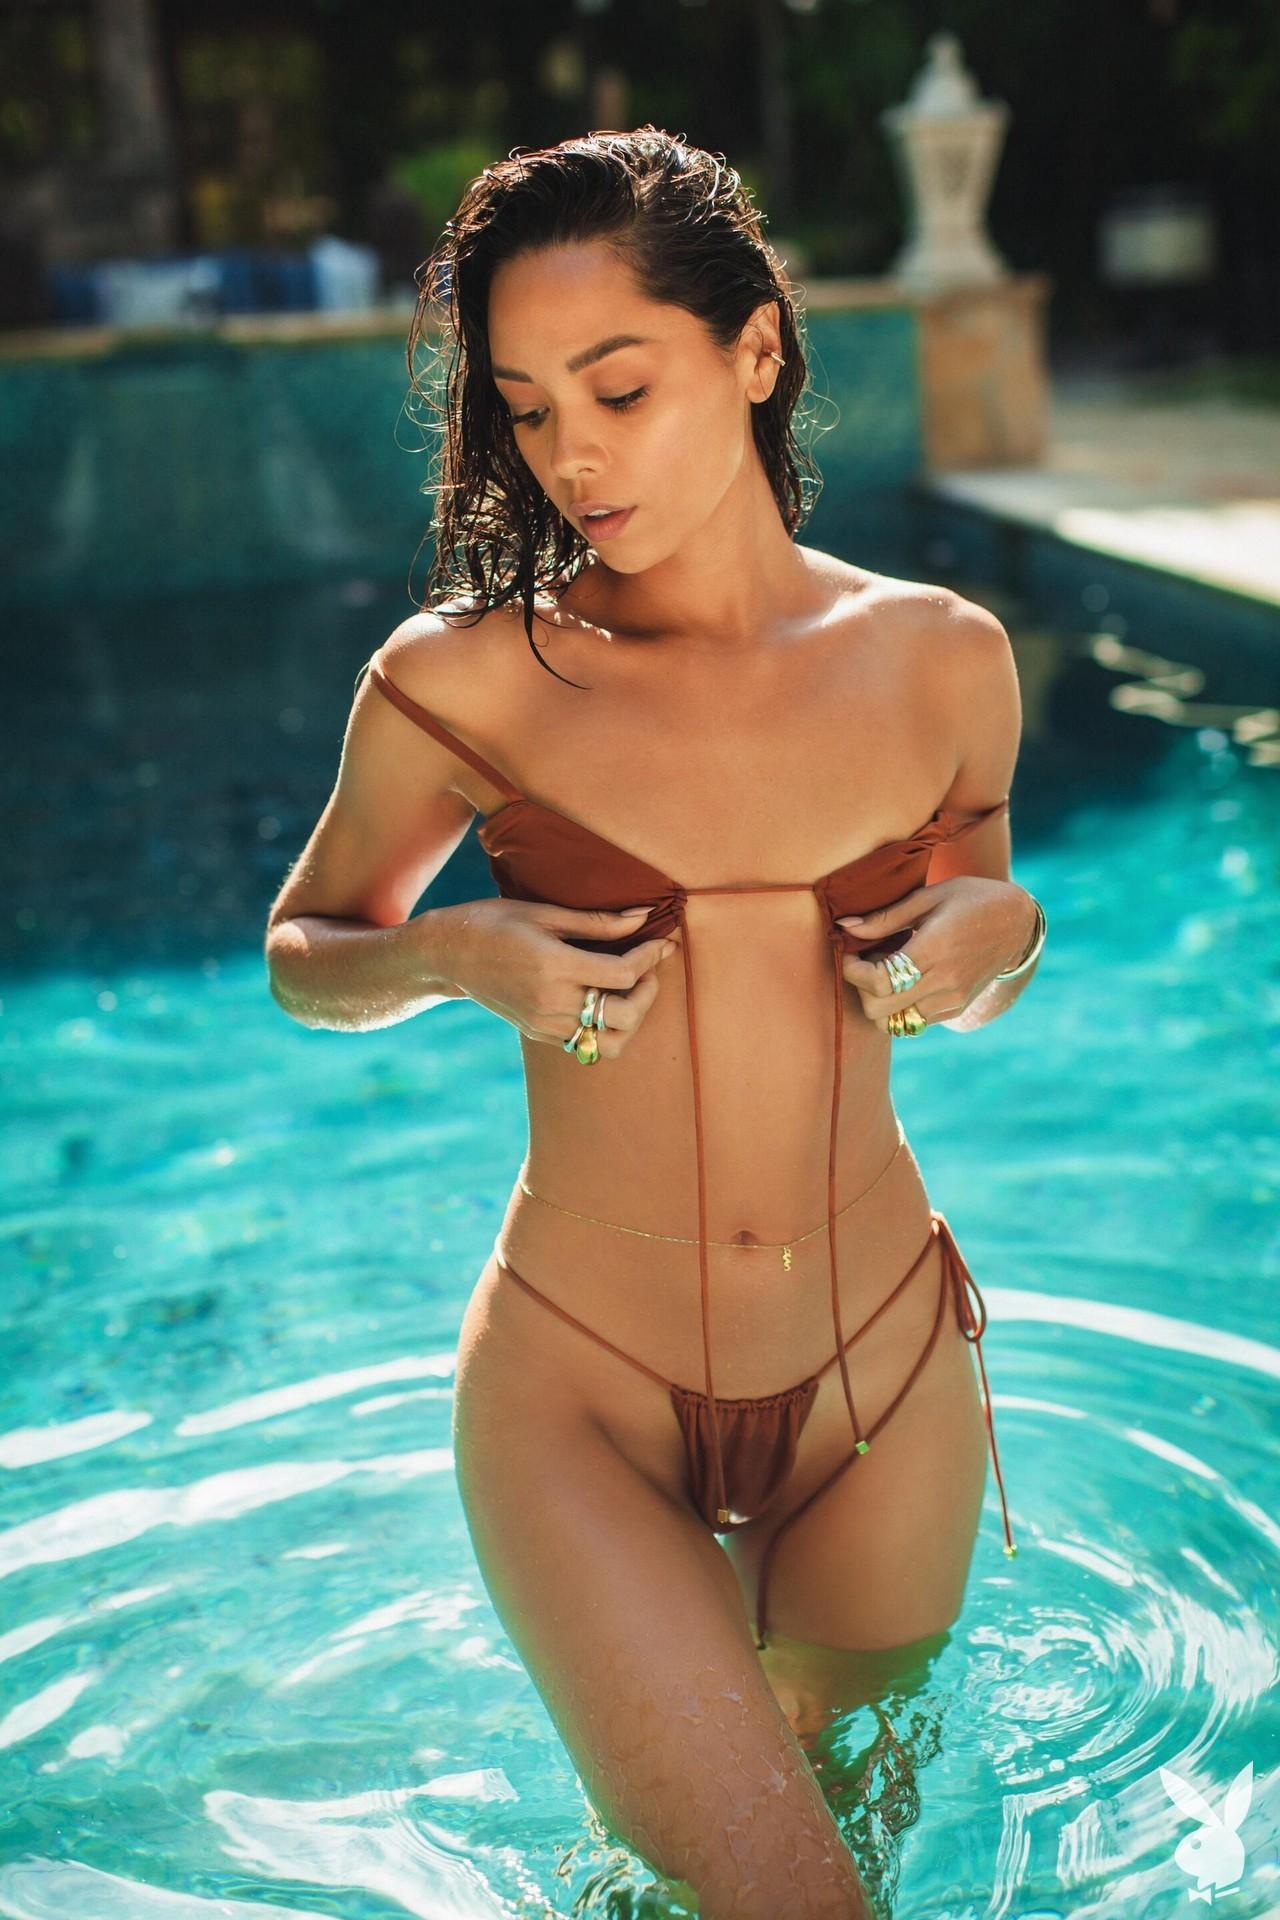 Playmate September 2020 Danielle Alcaraz Playboy Plus (36)